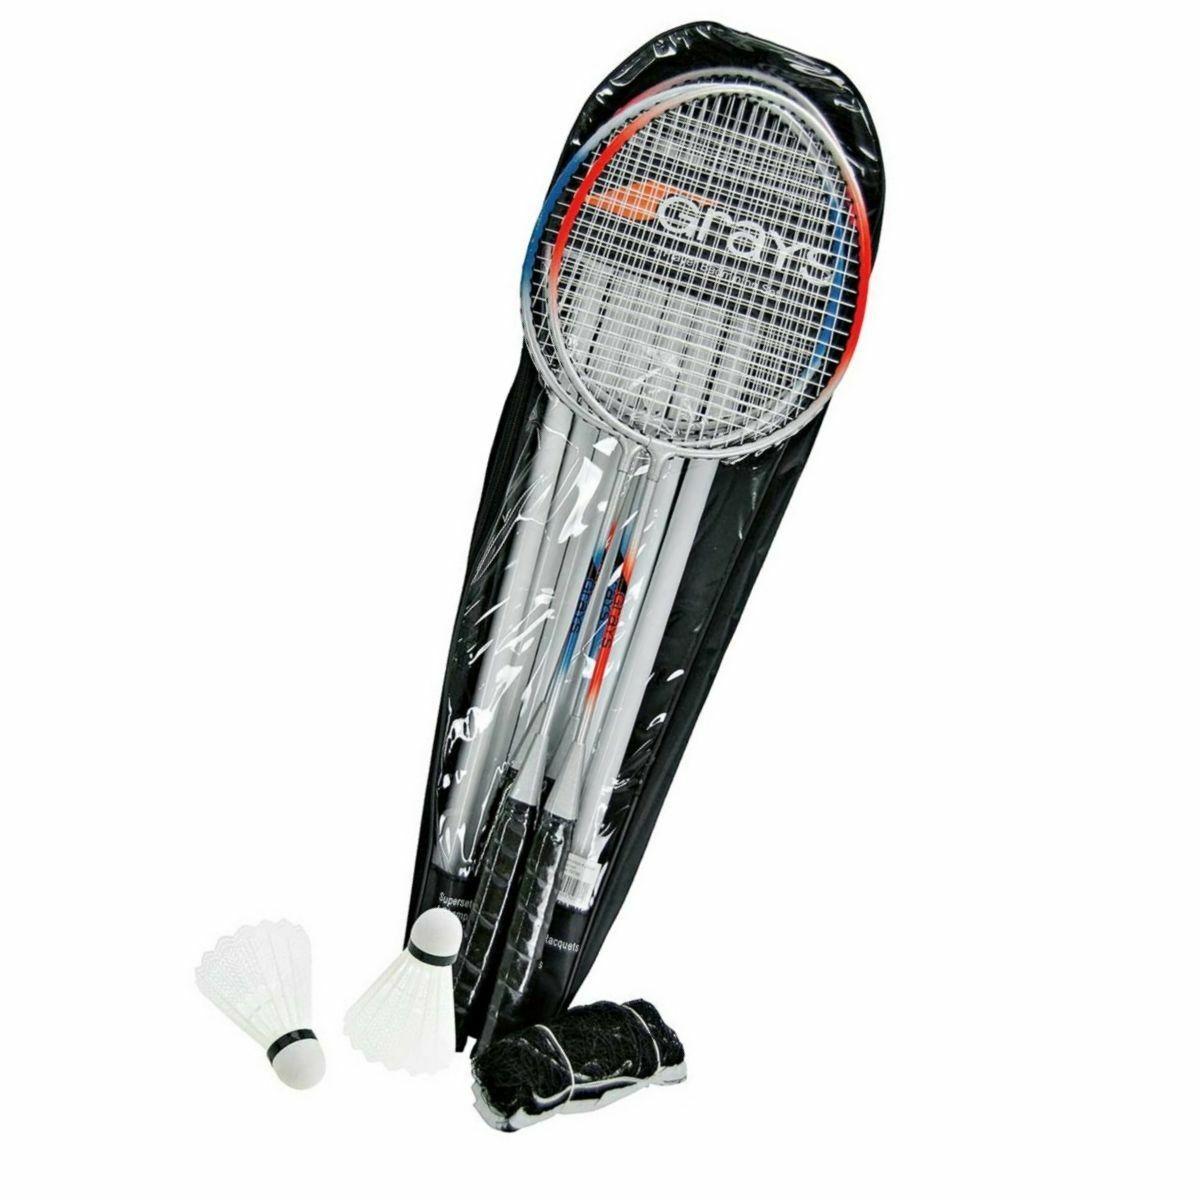 Grays 4 Player Badminton Combo Set: 4 Racquets, Bag, Net ...